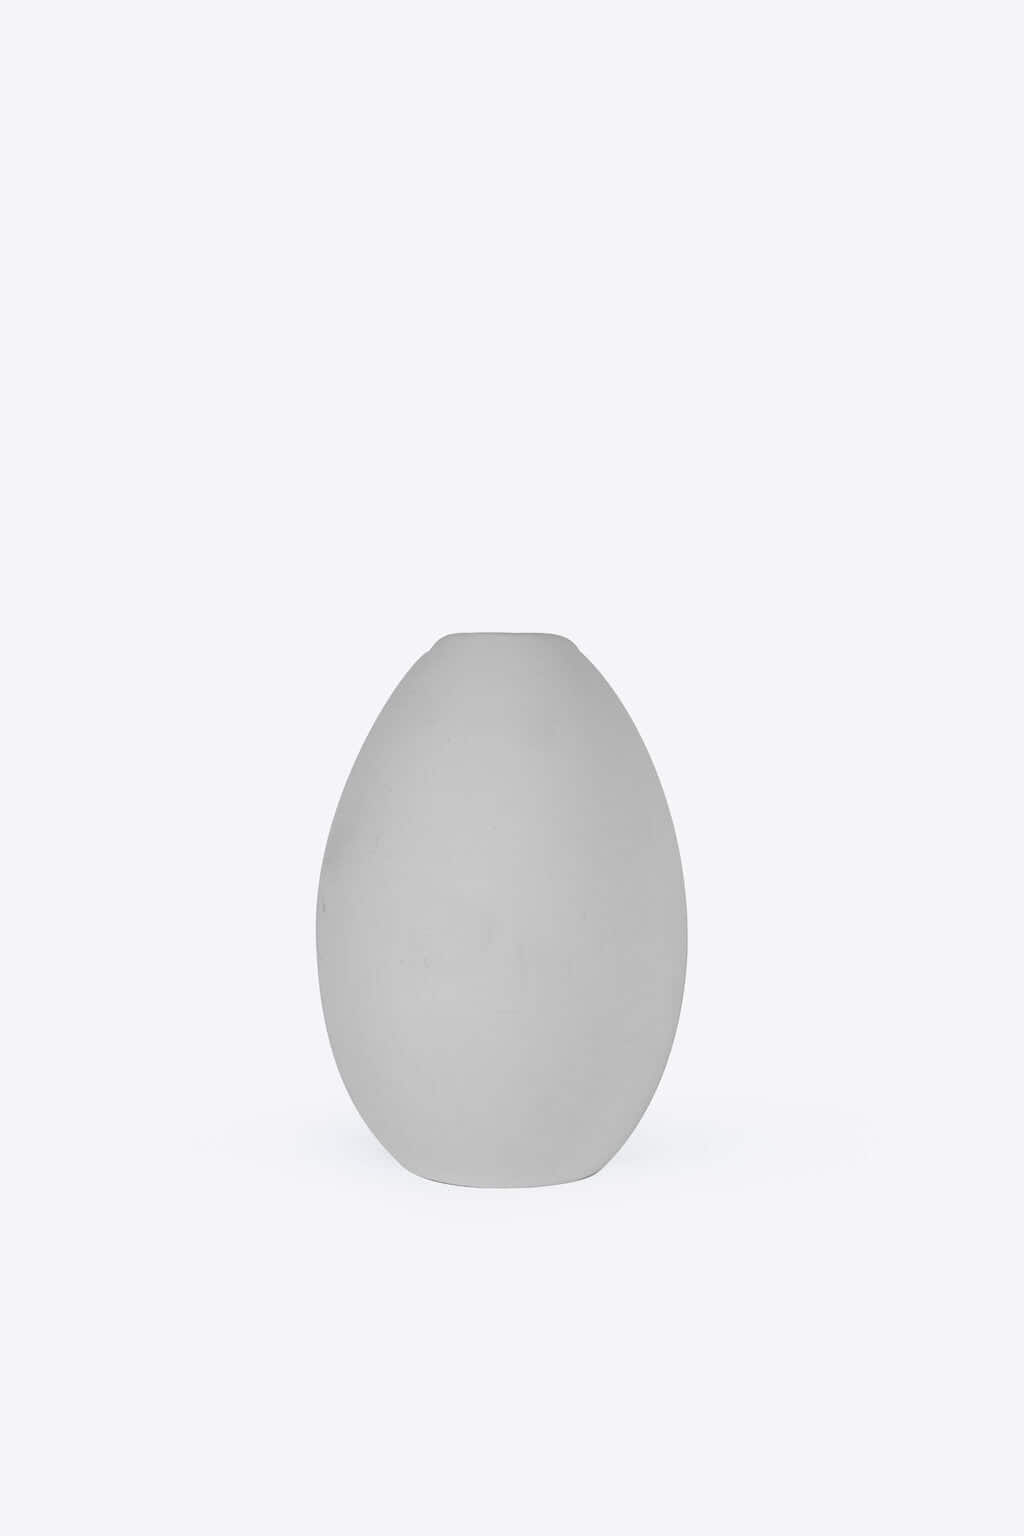 Short Oval Vase 3131 Gray 2